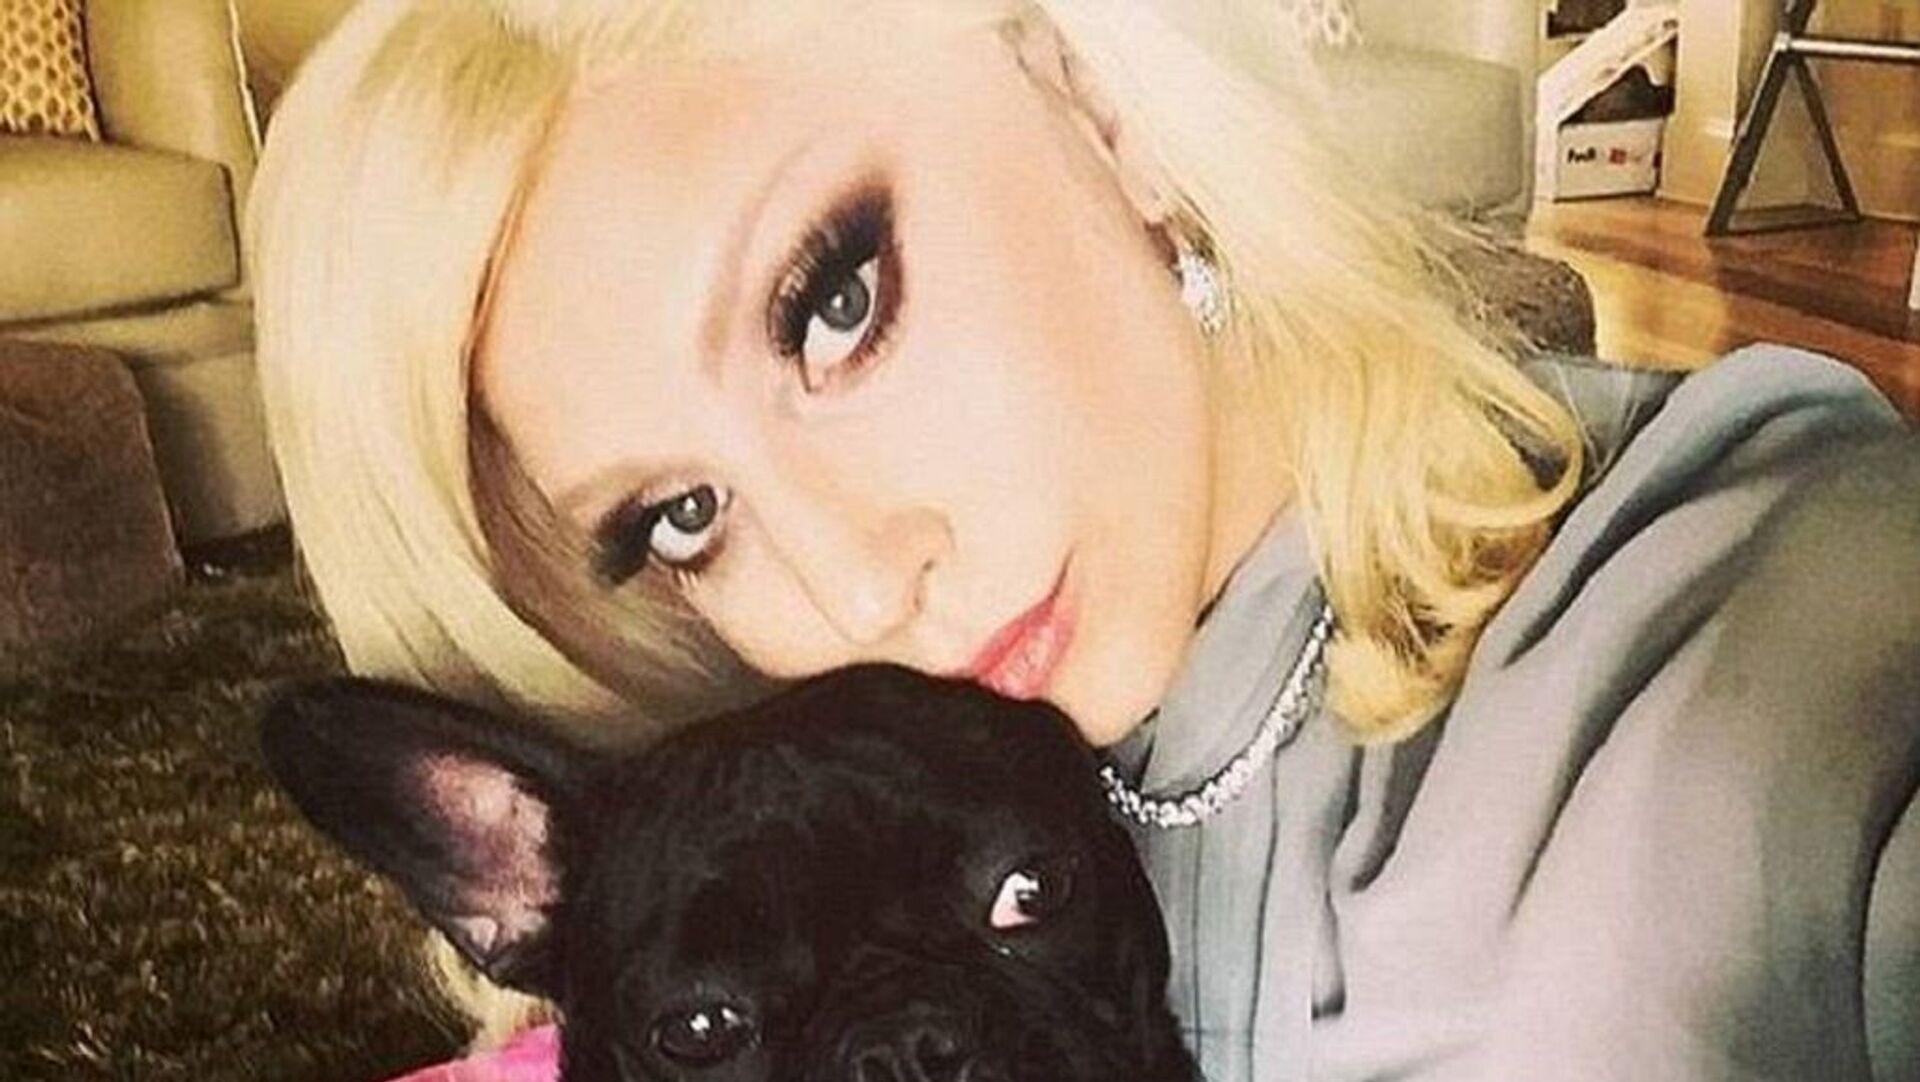 Lady Gaga: Πυροβόλησαν τον άντρα που έβγαζε βόλτα τα σκυλιά της και έκλεψαν τα δύο bulldogs της - Sputnik Ελλάδα, 1920, 21.09.2021